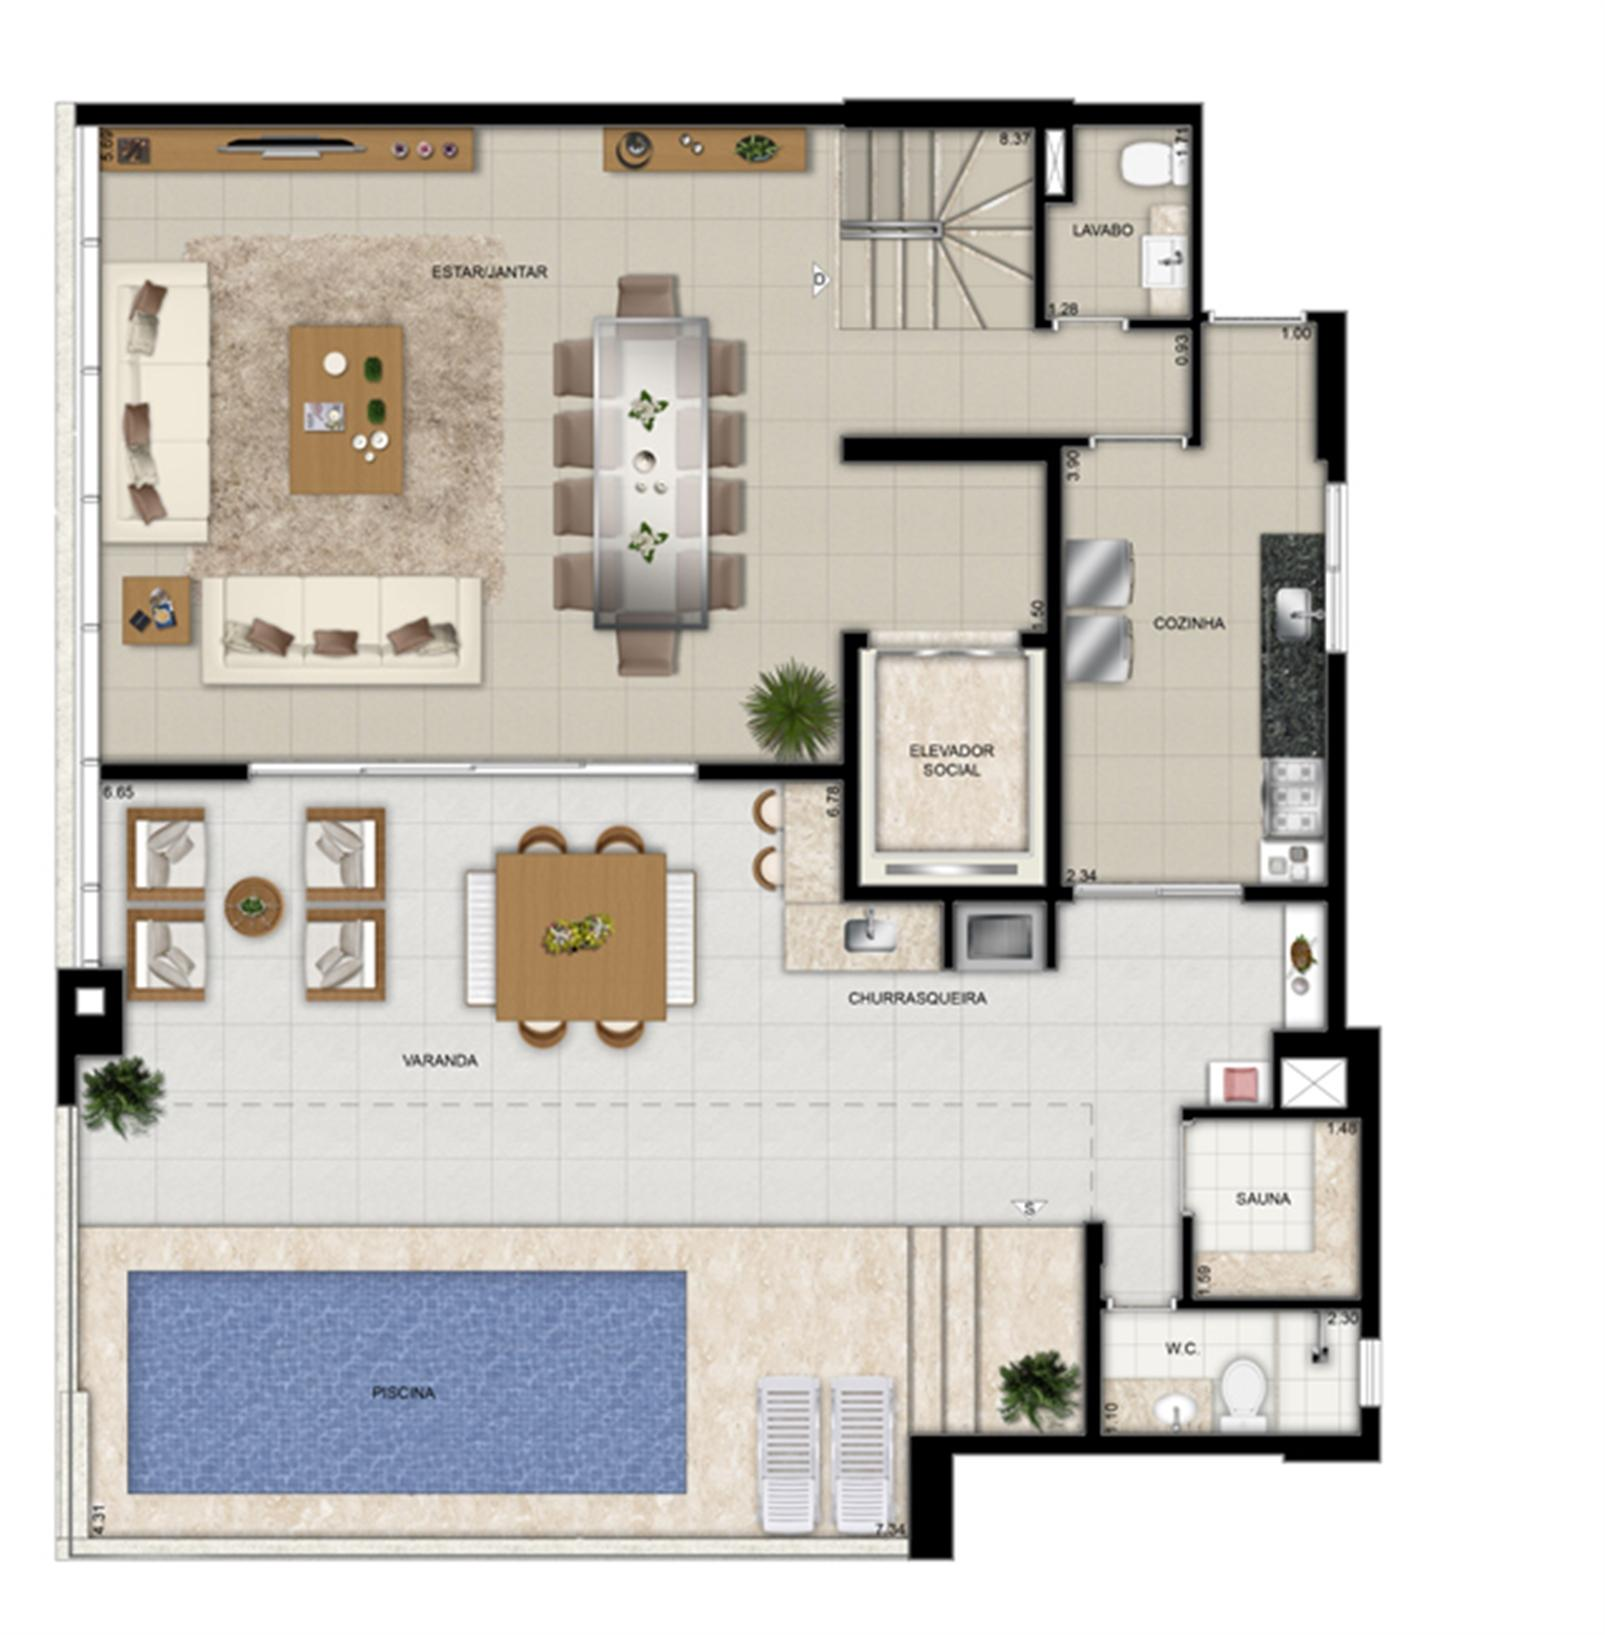 Planta duplex superior final 2 | Domani LifeStyle – Apartamentono  Setor Marista - Goiânia - Goiás